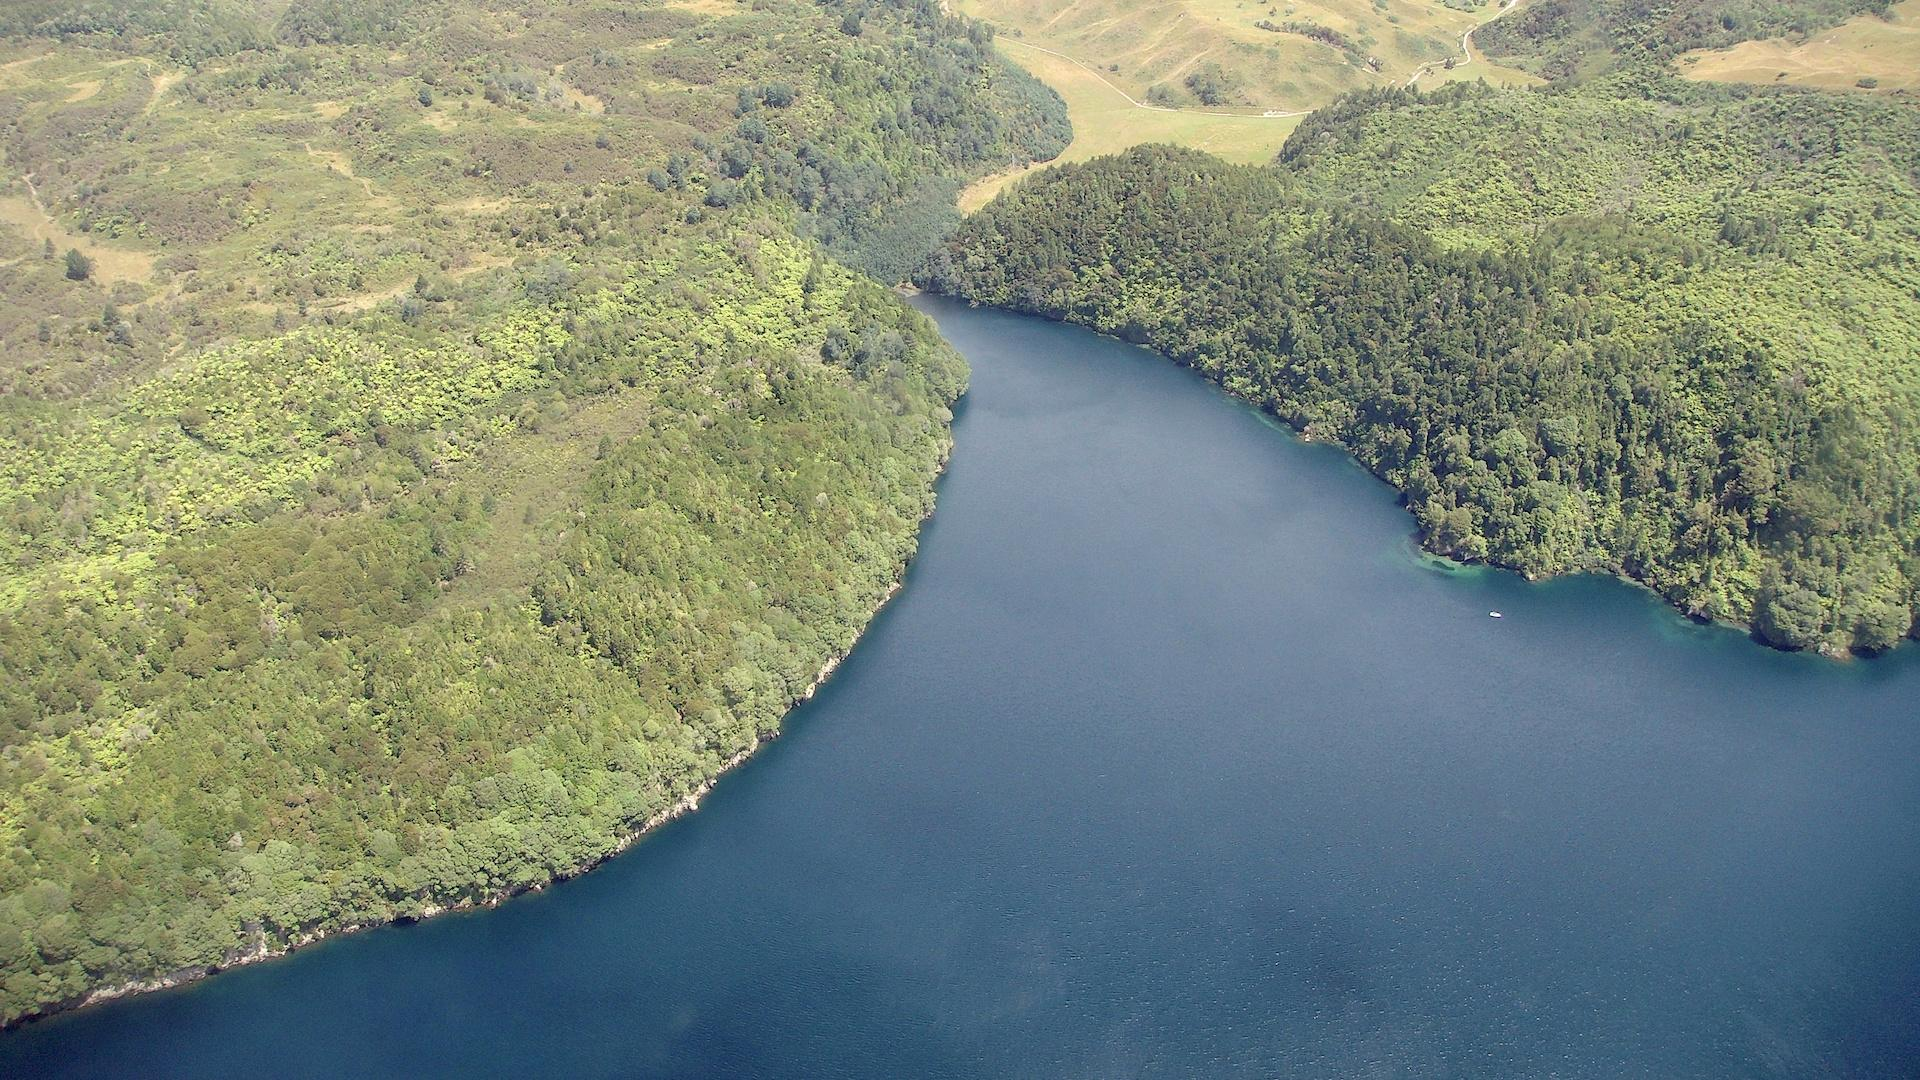 rotorua-nueva-zelanda-imagenes-27112016-in3